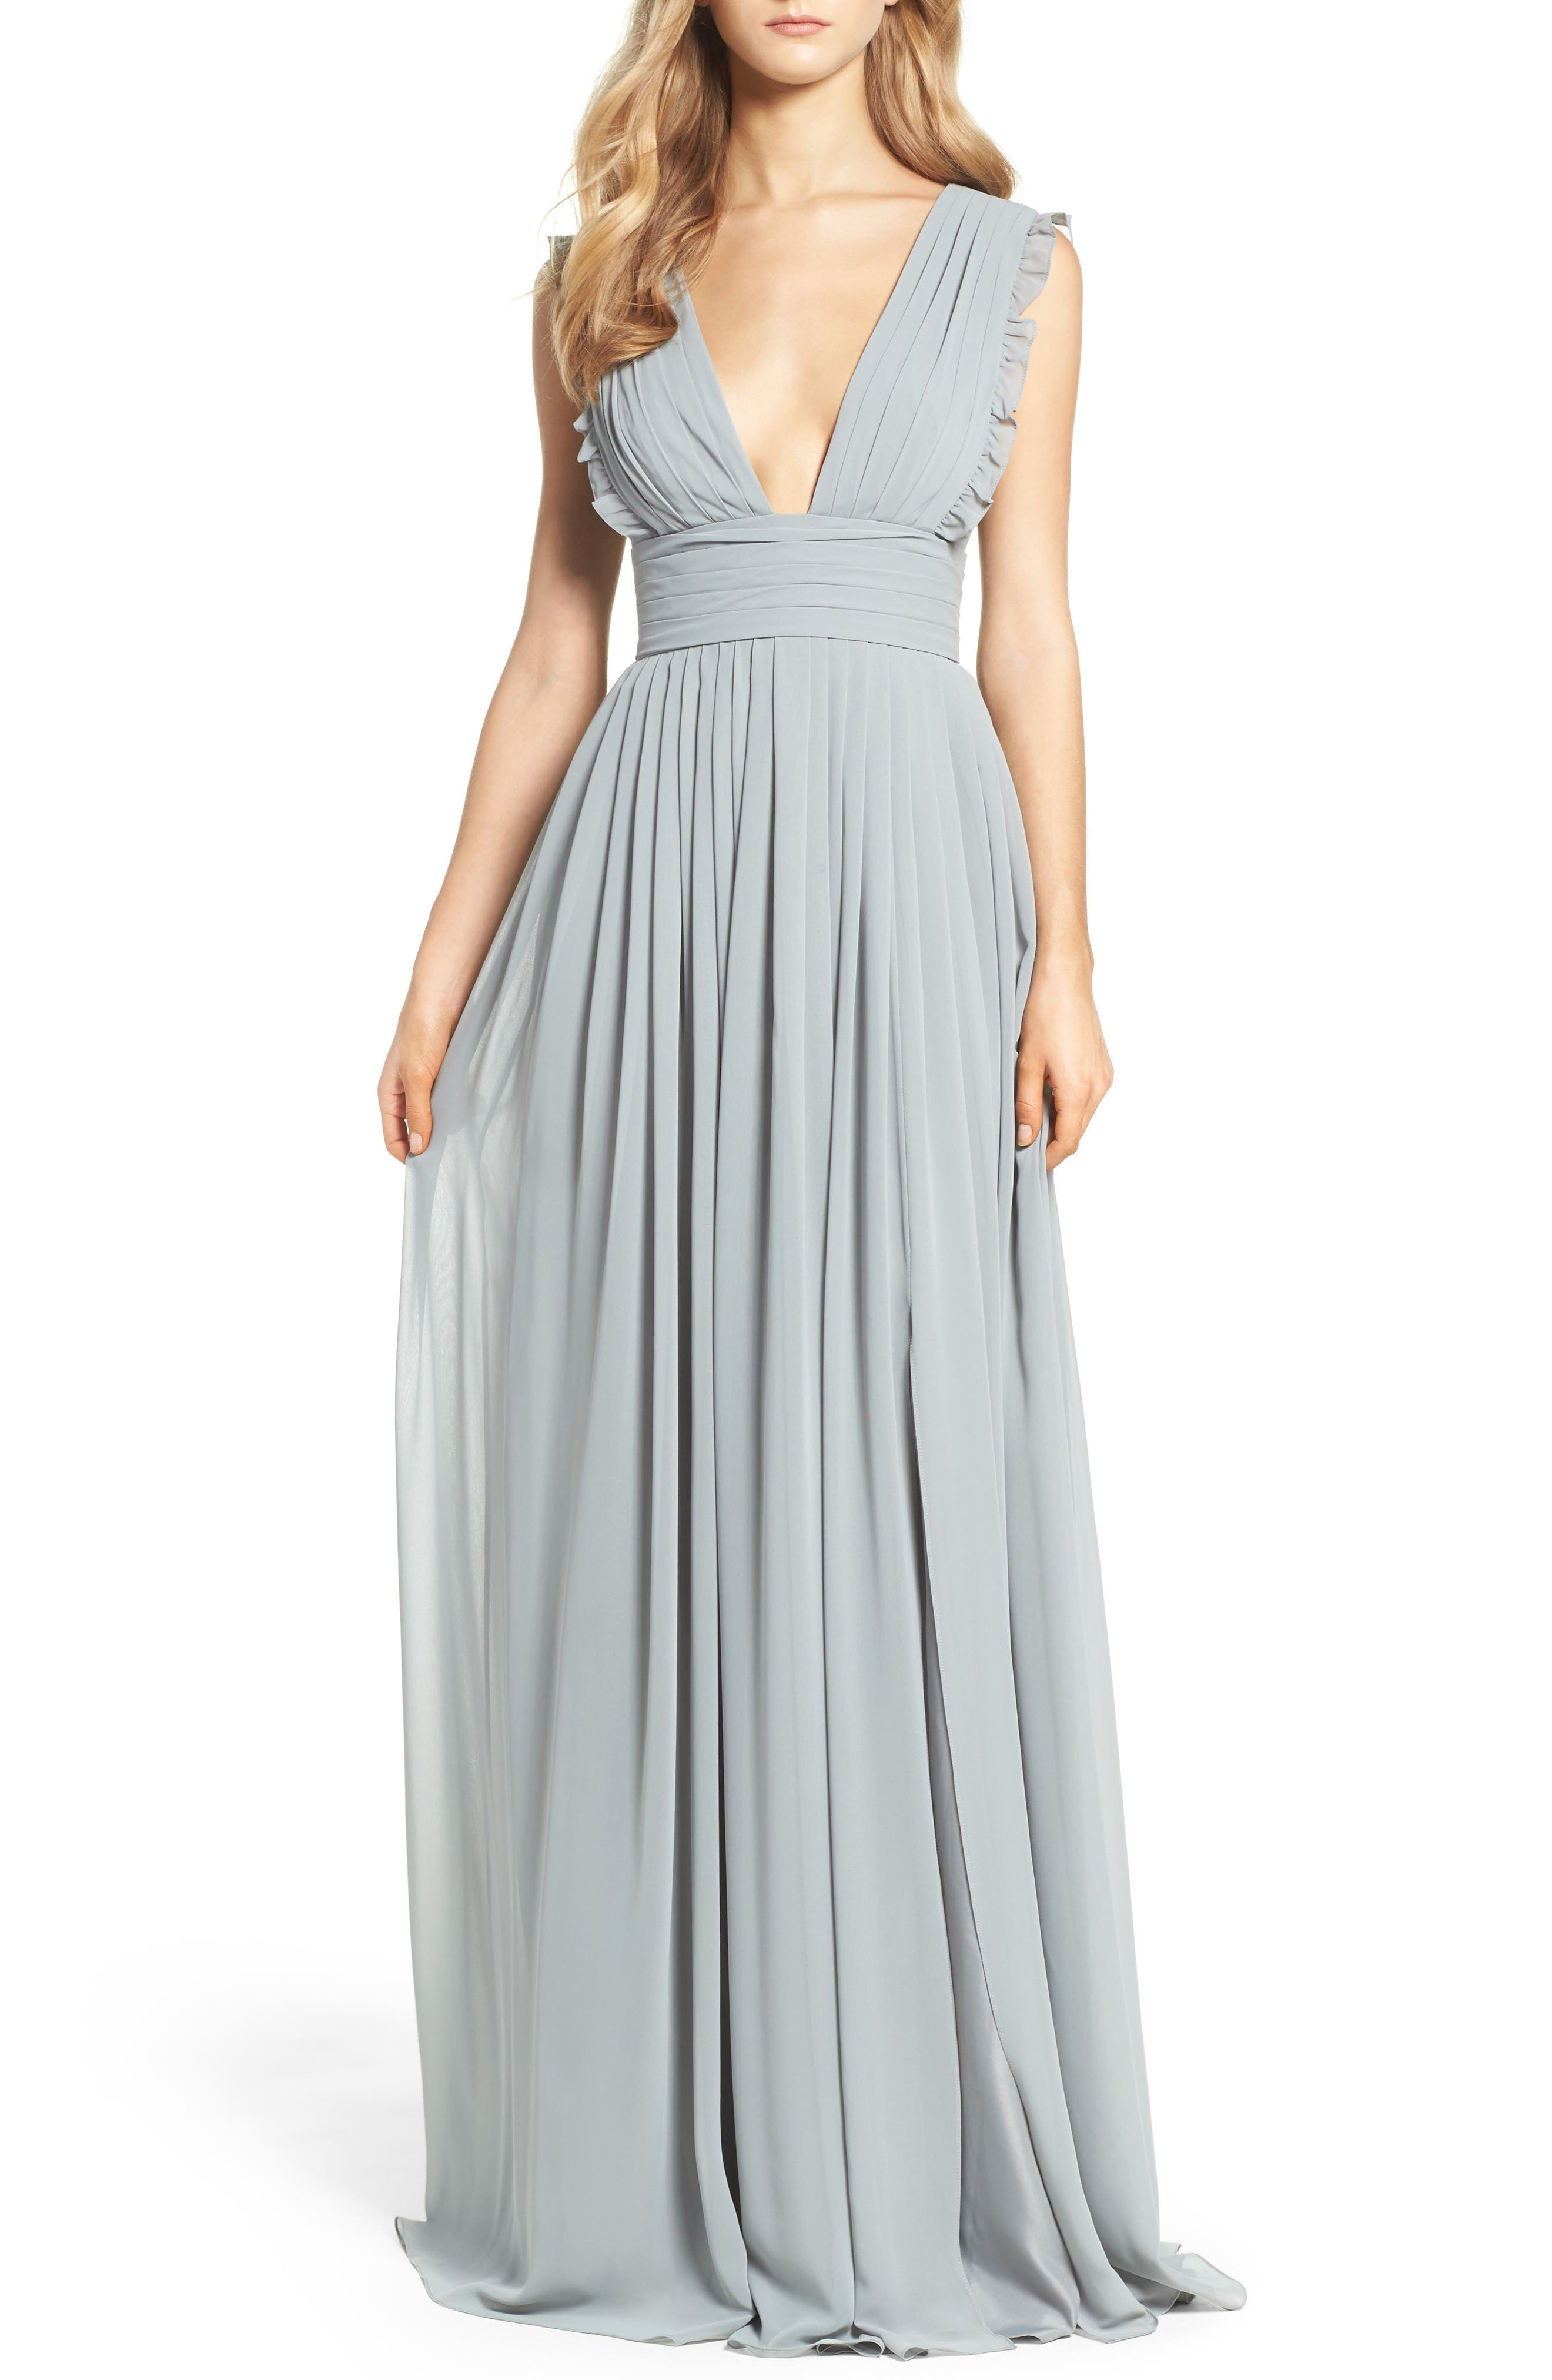 Alternate Image 1 Selected - Monique Lhuillier Bridesmaids Deep V-Neck Ruffle Pleat Chiffon Gown